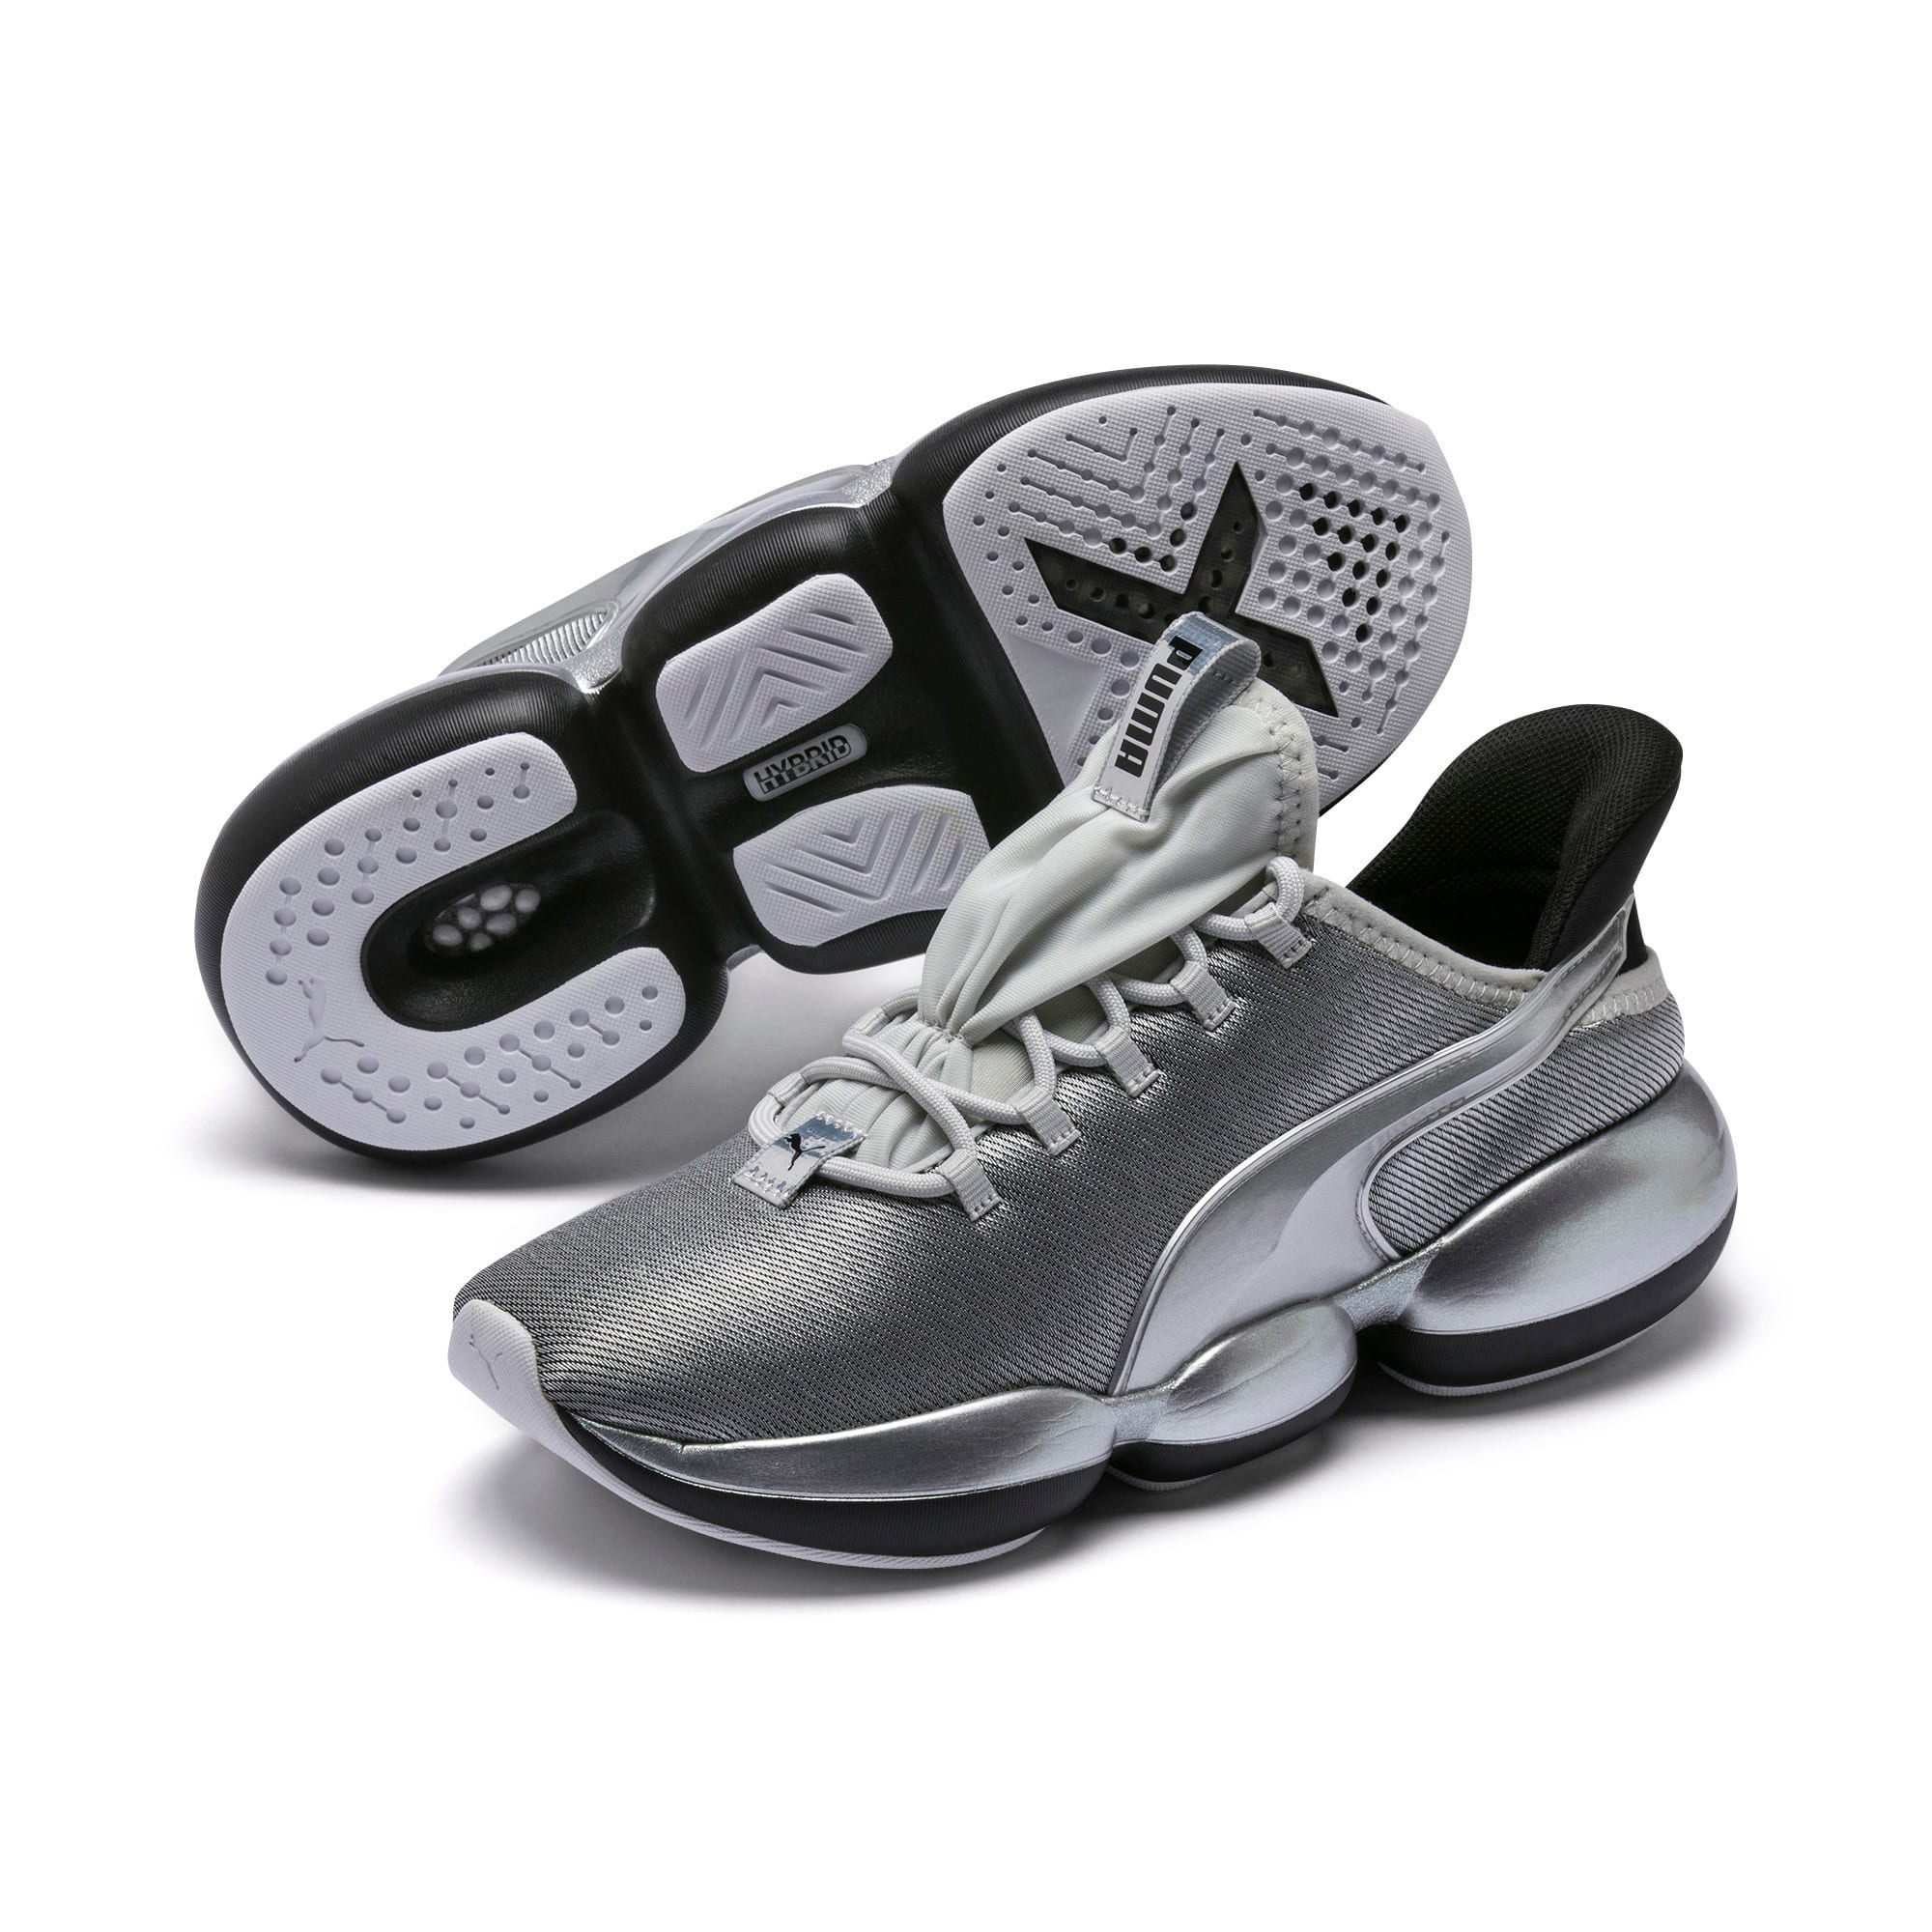 Thumbnail 2 of Mode XT Lust Women's Training Shoes, Glacier Gray-Puma Black, medium